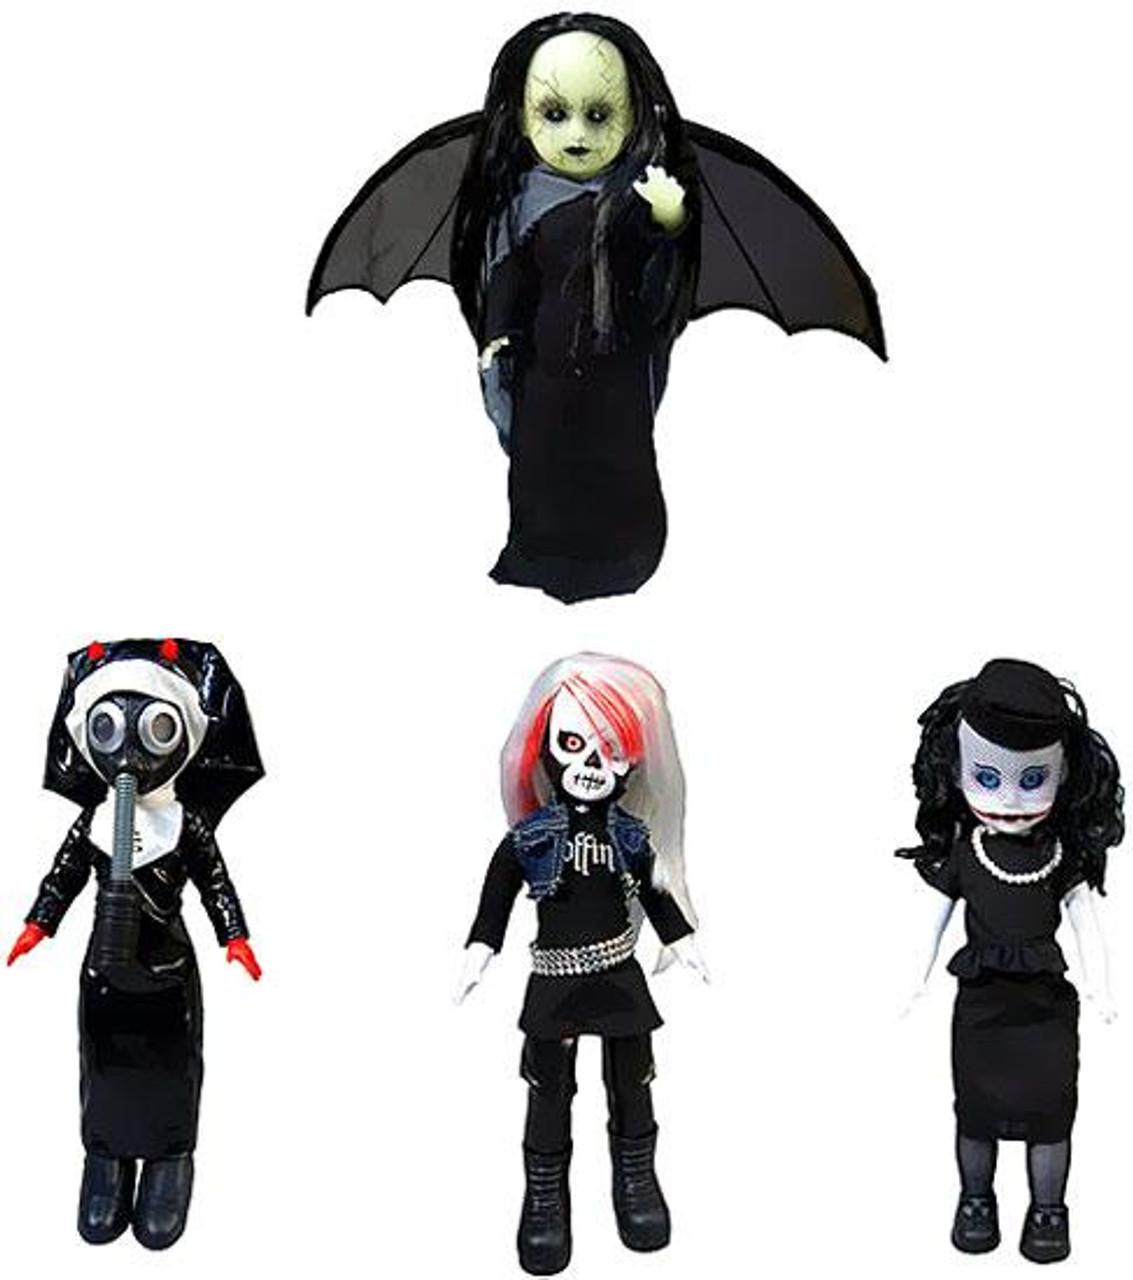 Living Dead Dolls Resurrection Series 7 Set of 4 Exclusive Dolls [Variant]